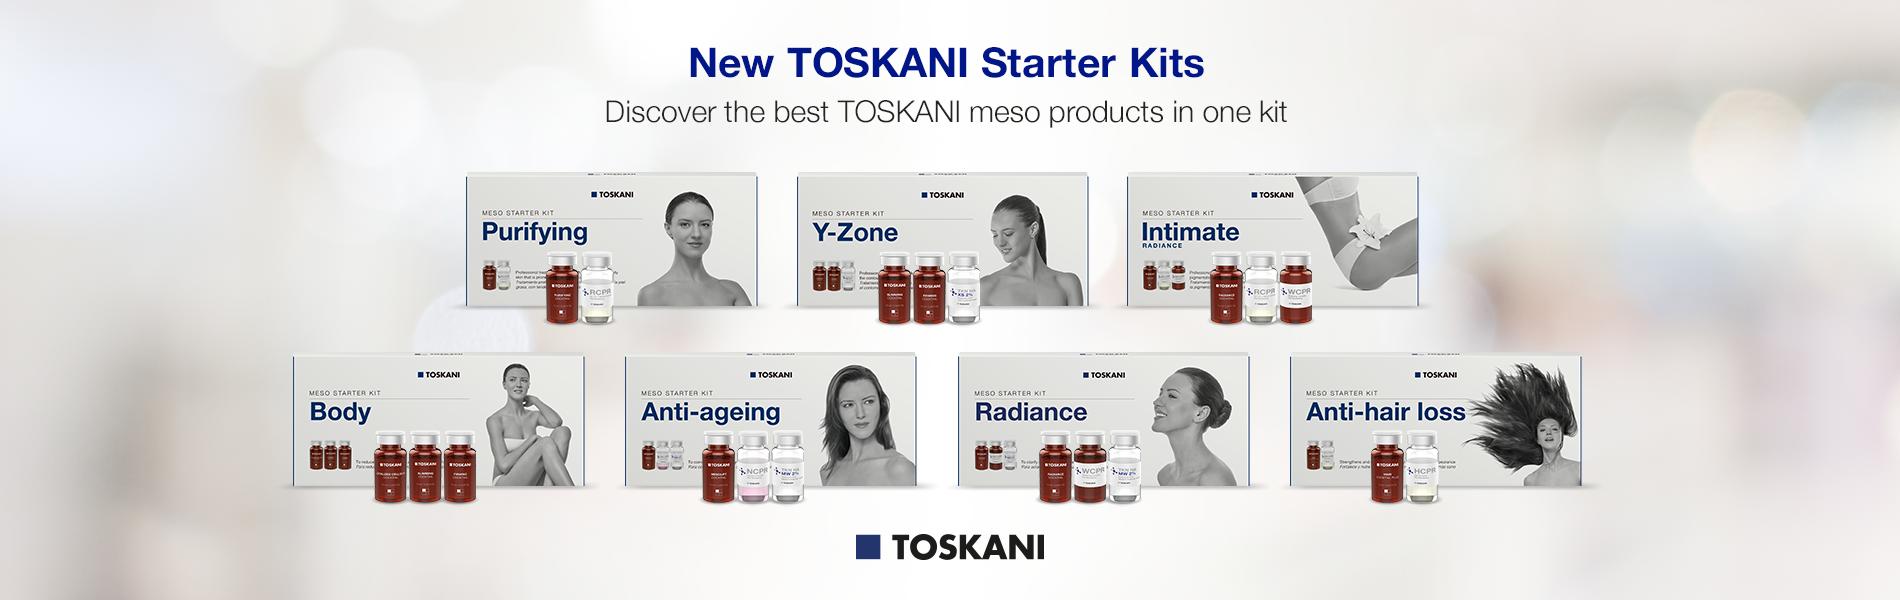 New Meso Starter Kits